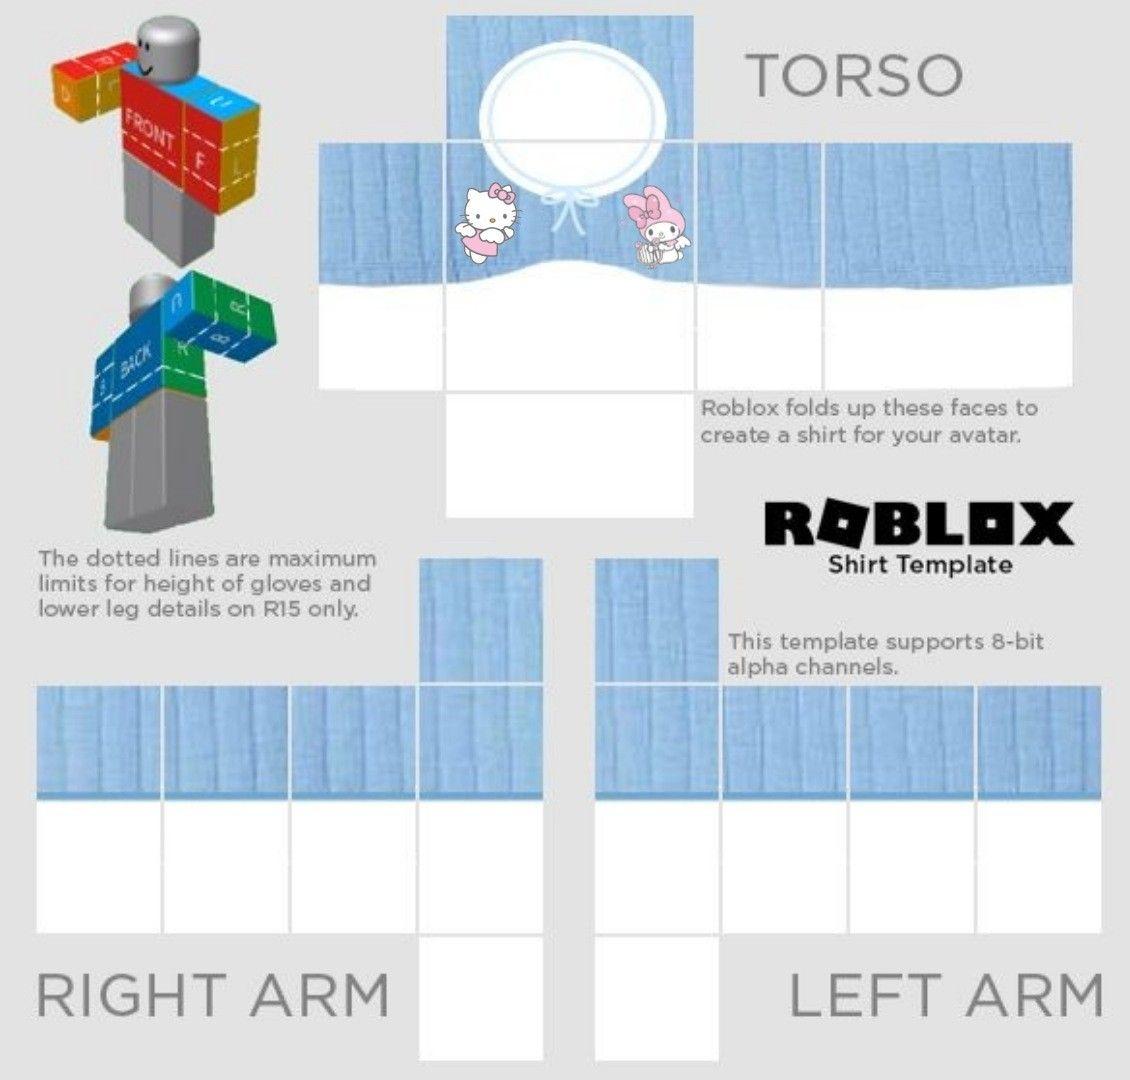 Pin By Nesafa Gotin On Ropa De Roblox Clothing Templates Roblox Shirt Create Shirts